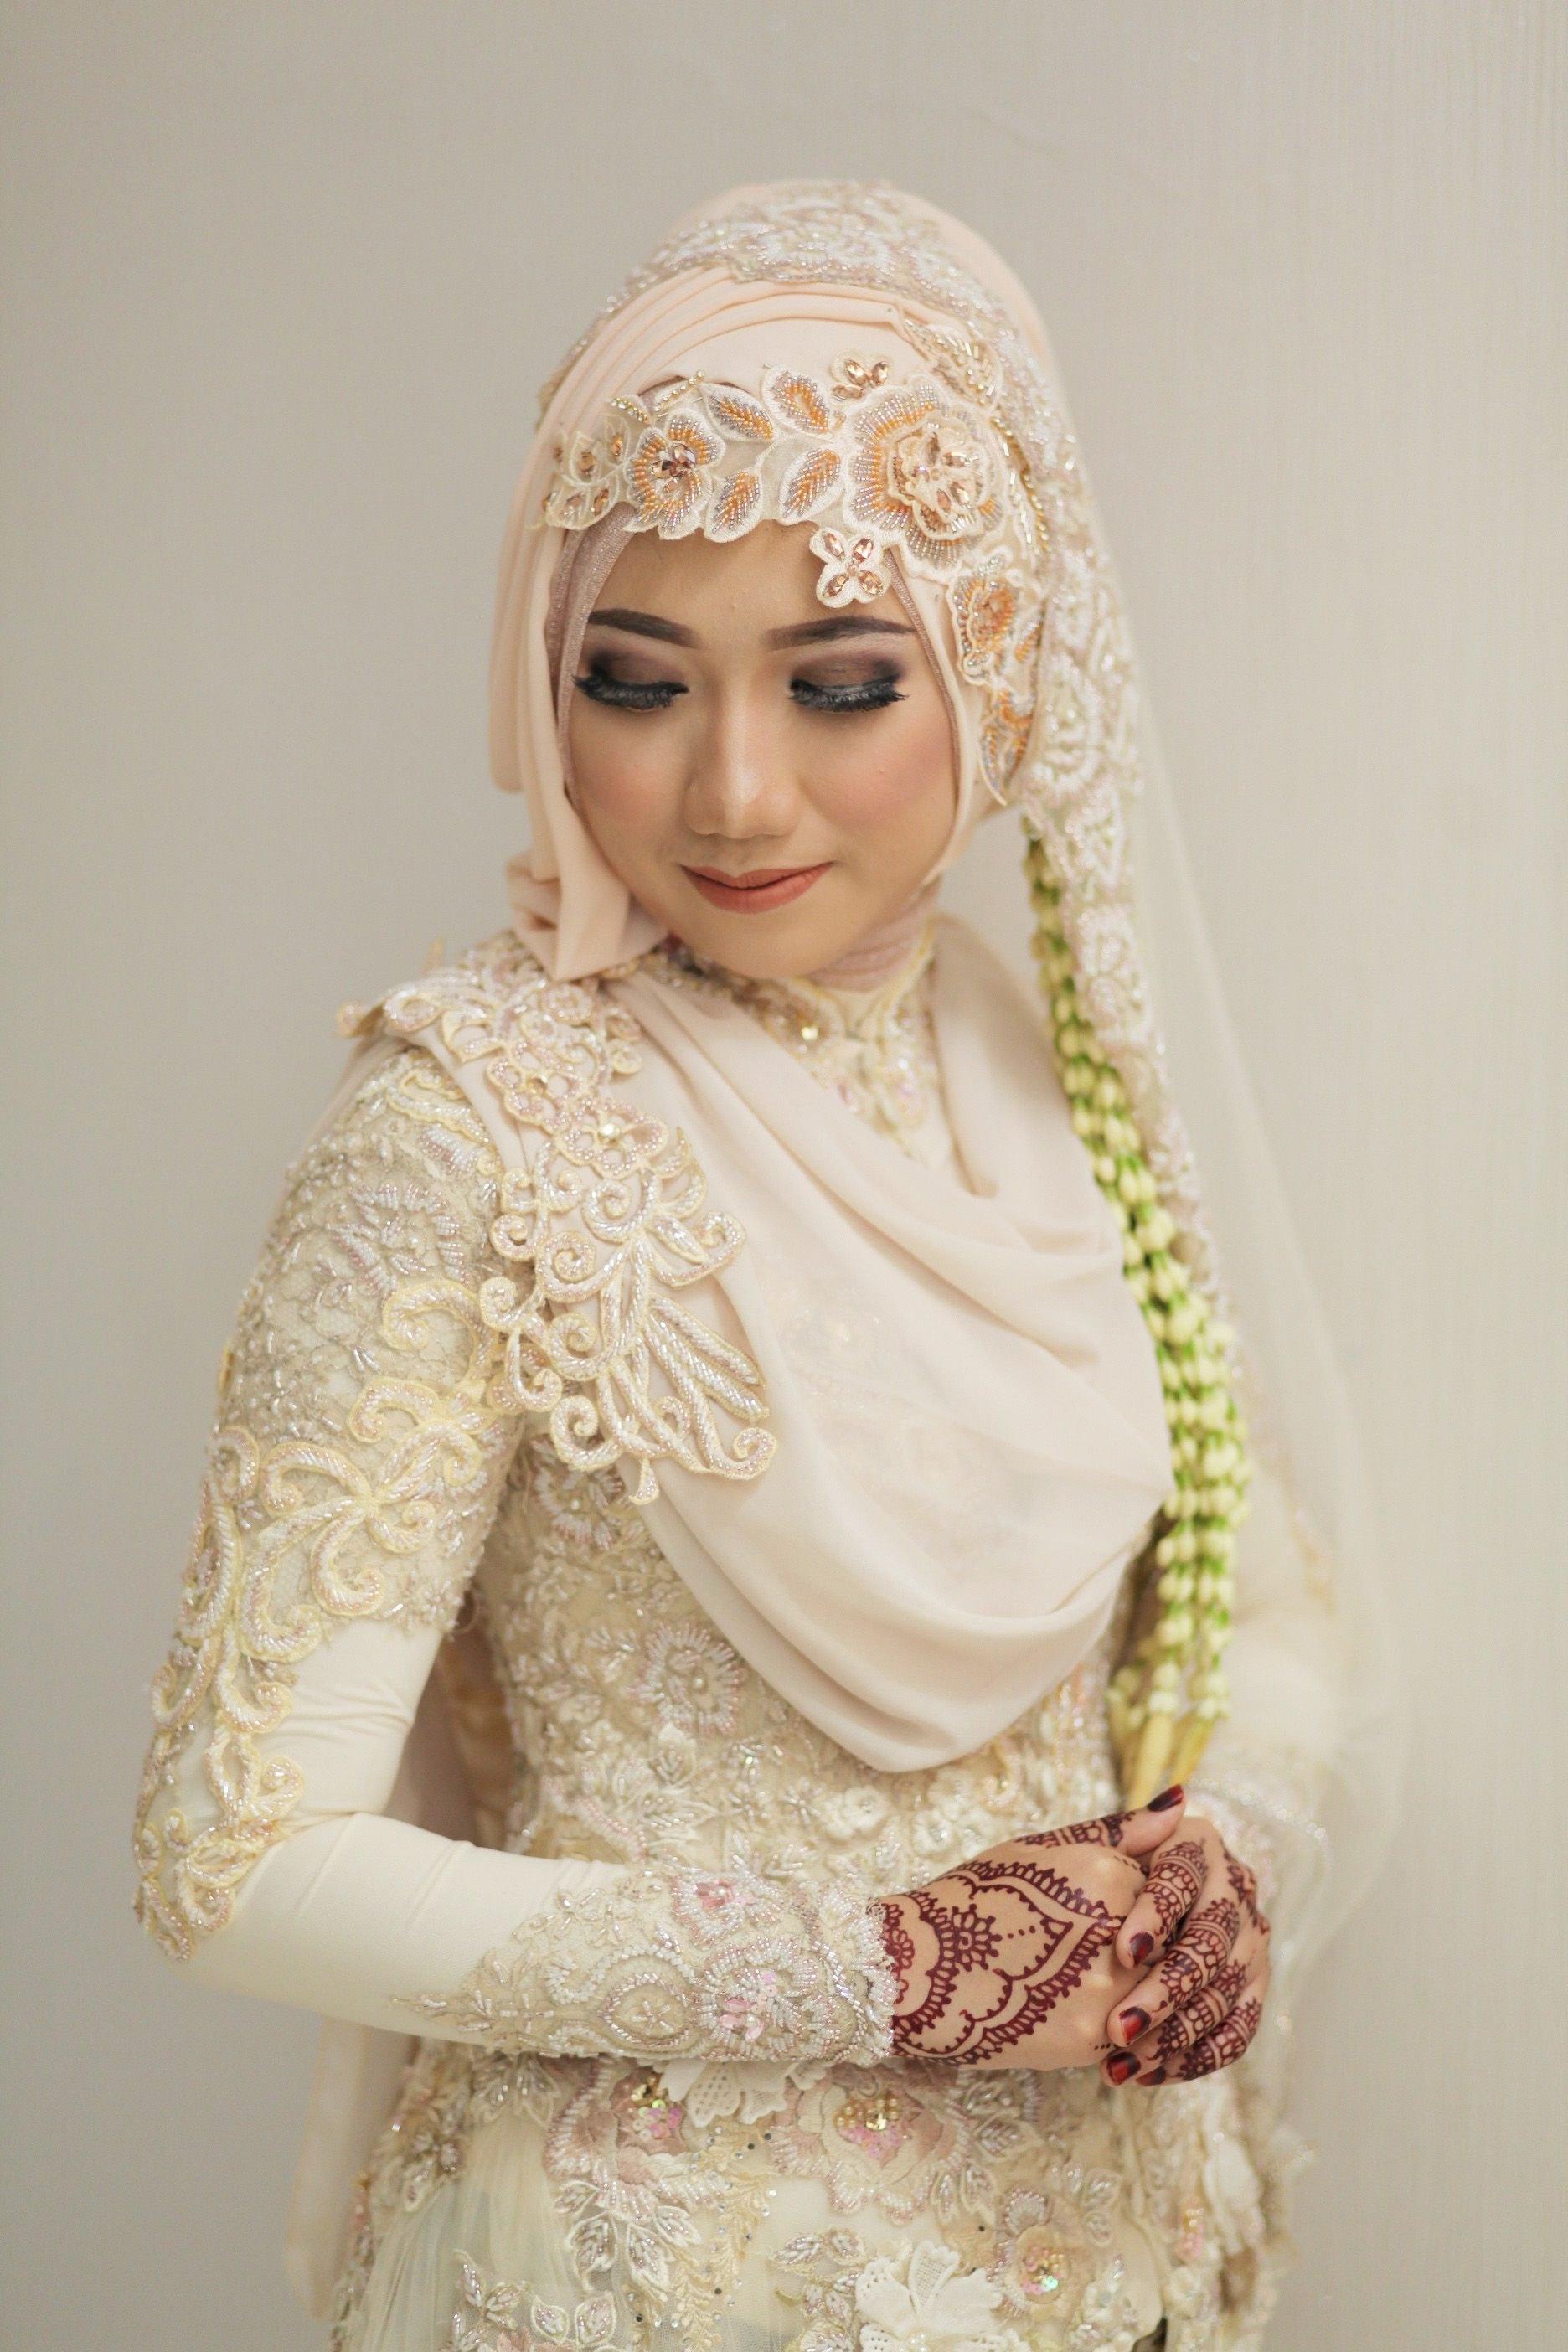 Ide Baju Pendamping Pengantin Muslimah Tldn Awalia Nofitasari Awalianofitasar On Pinterest